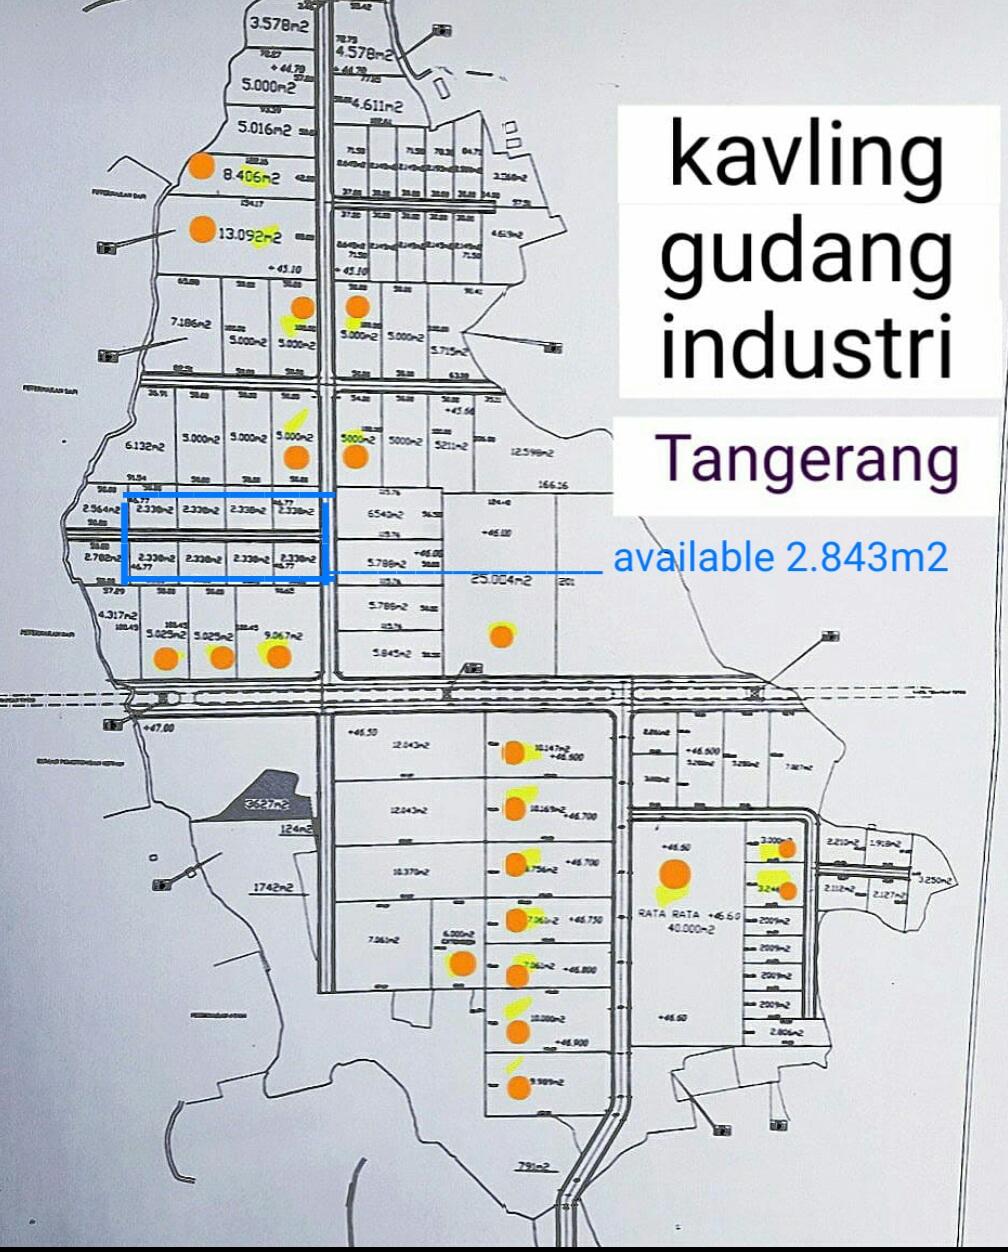 KAVLING GUDANG/PABRIK LEGOK SHGB MULAI 2000 AN M2 – 10.000 M2